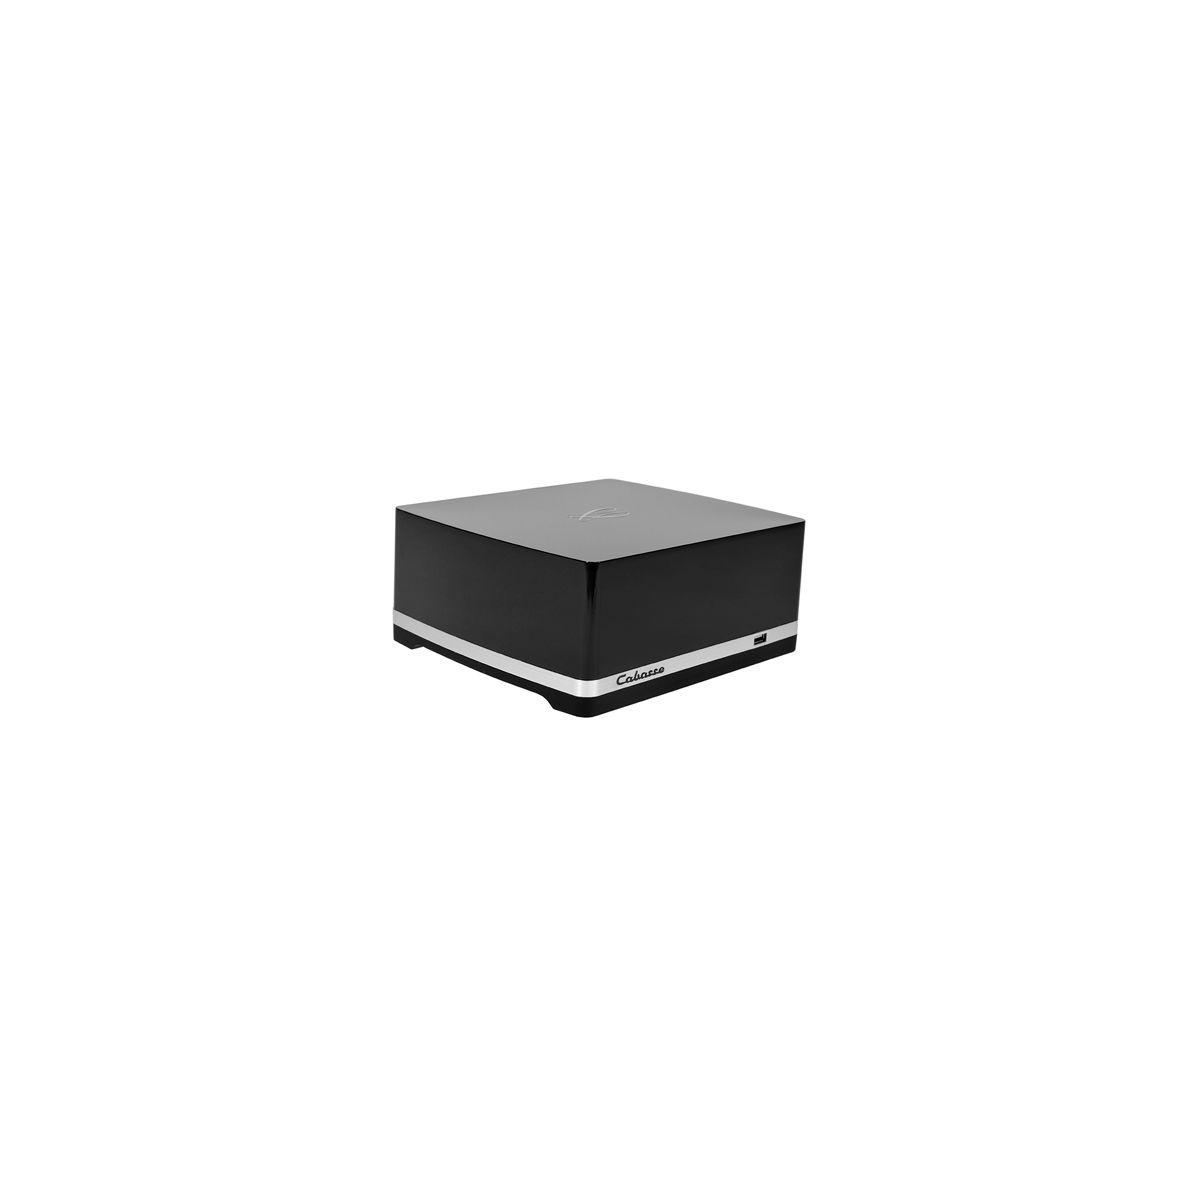 Solution multiroom wifi cabasse stream amp 100 - livraison offerte : code chronoff